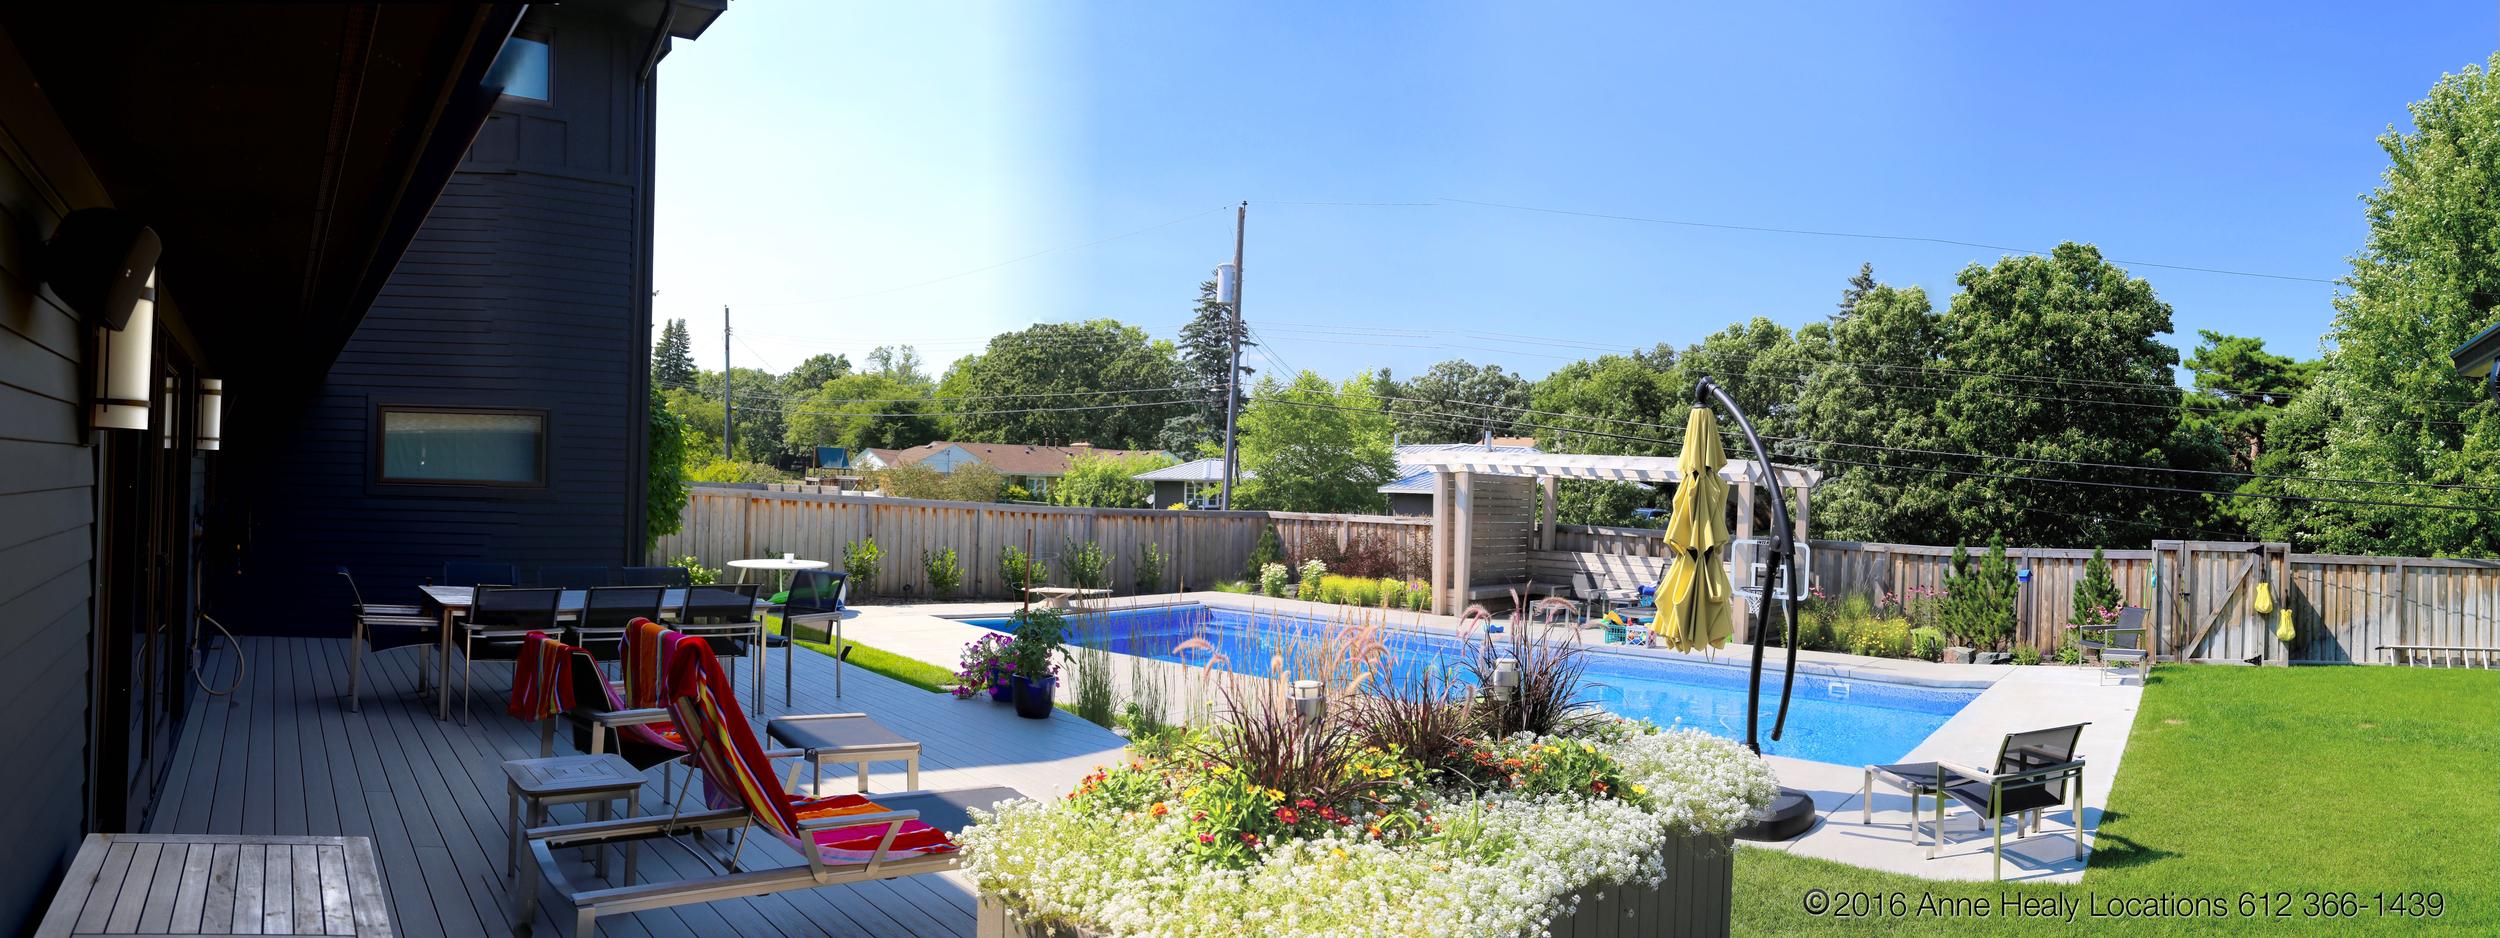 IMG_5647-Panorama.jpg